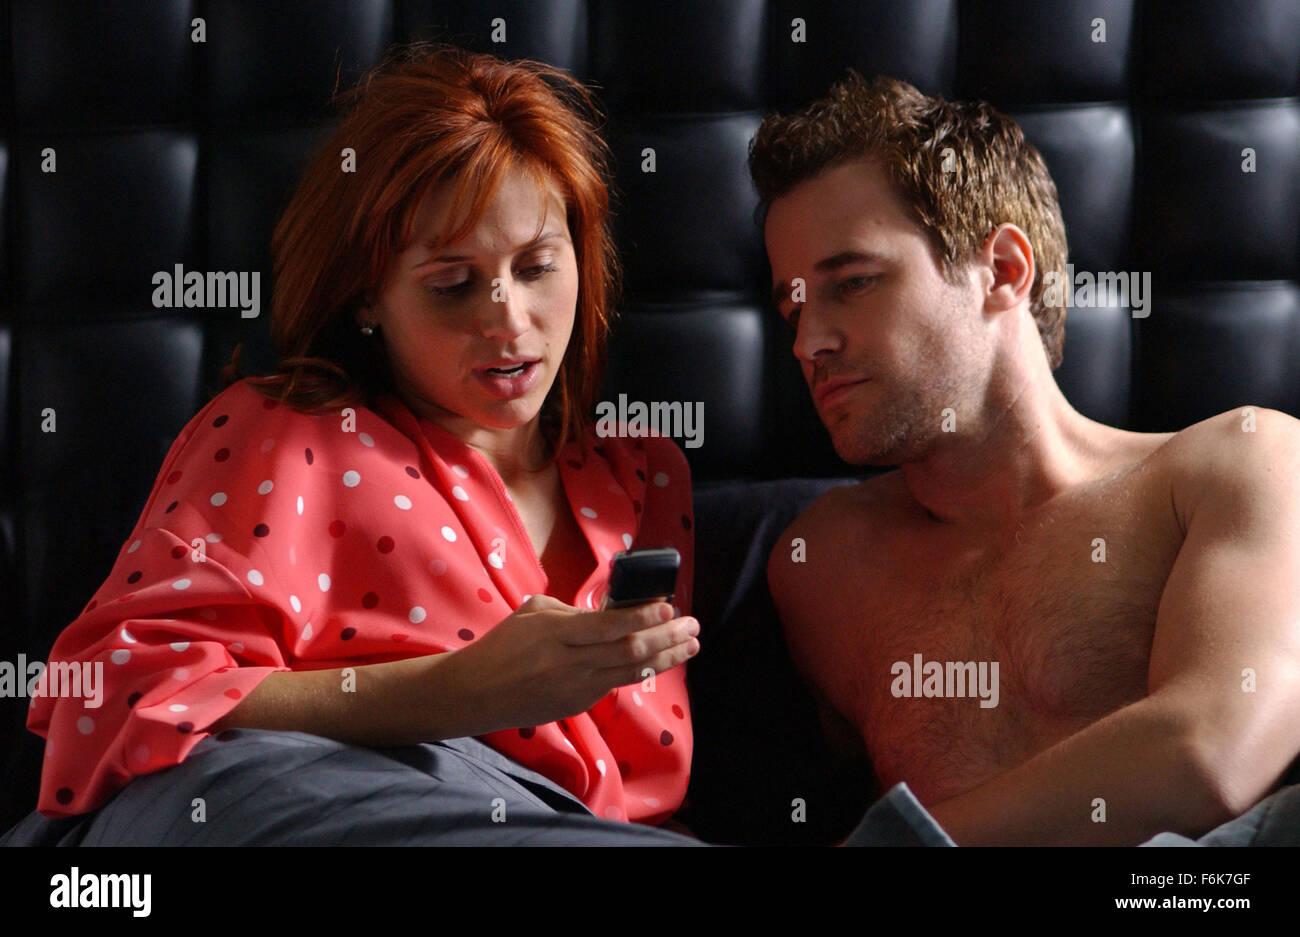 Filipinocupid dating sites